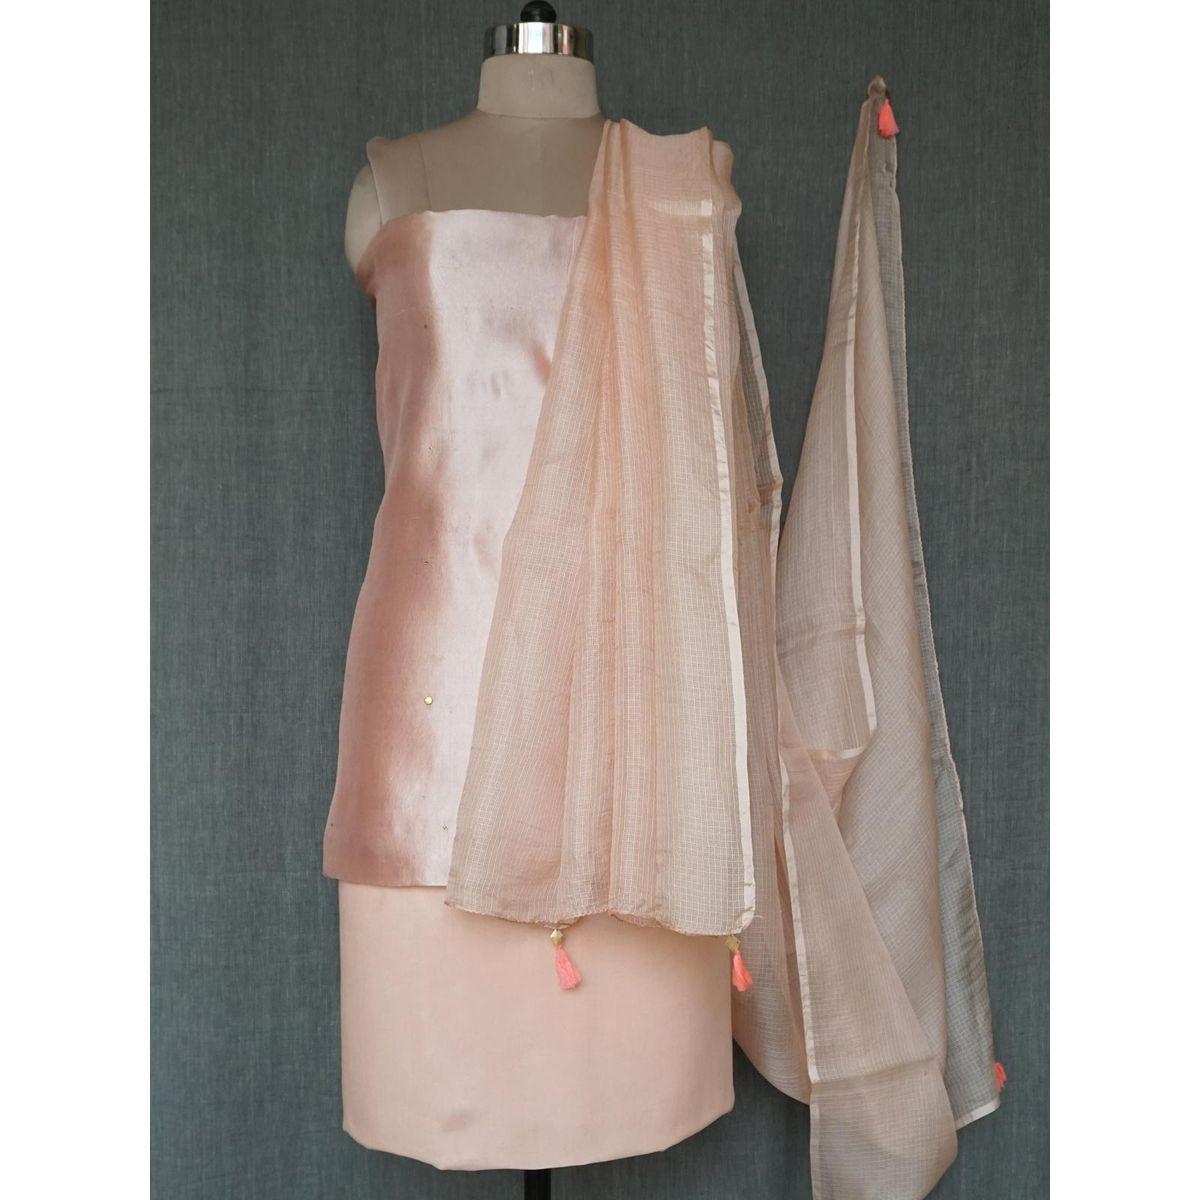 Cream silk dress material with dupatta